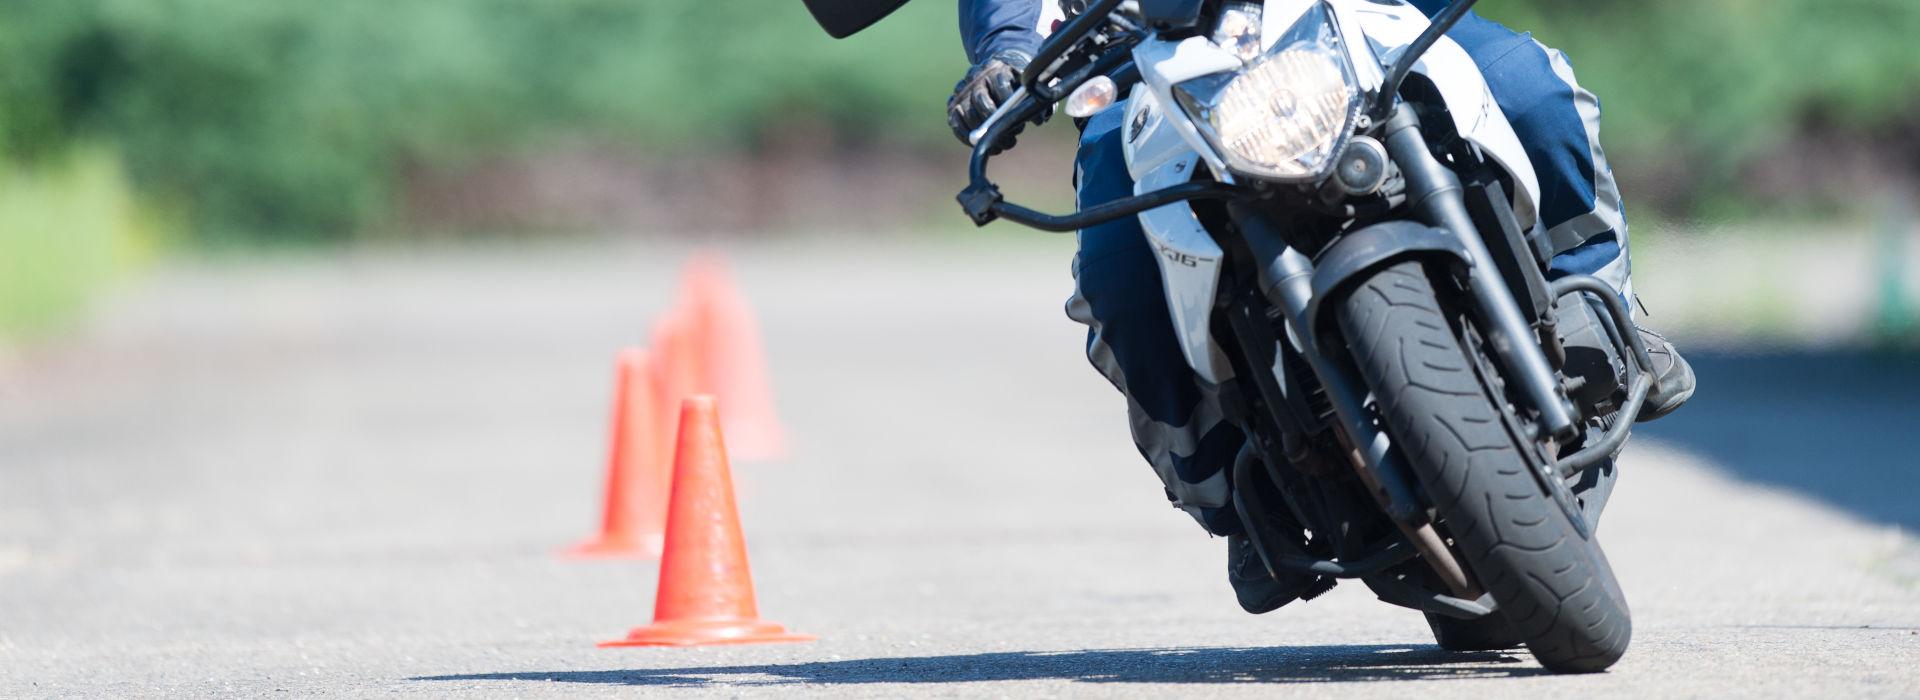 Motorrijbewijspoint Roosendaal motor rijvaardigheid